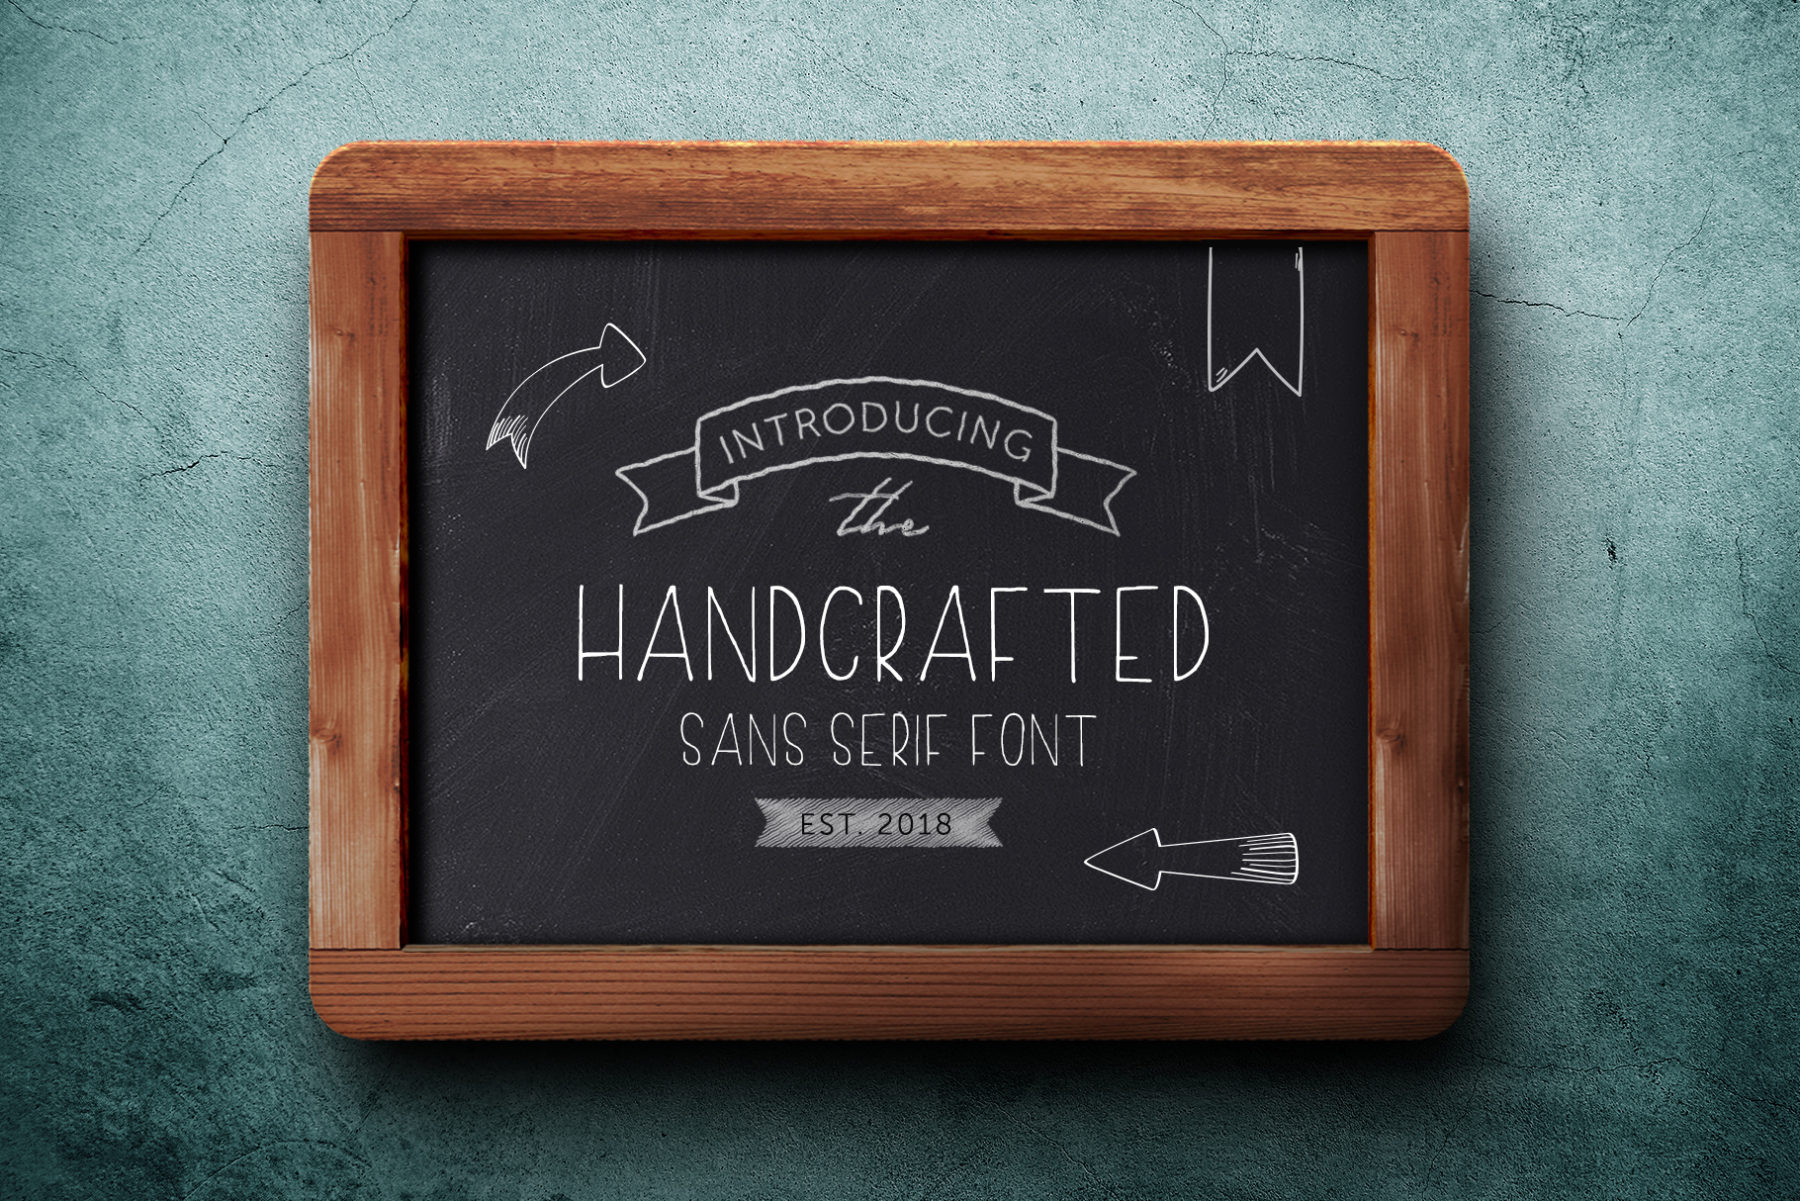 Handcrafted Sans Serif Font